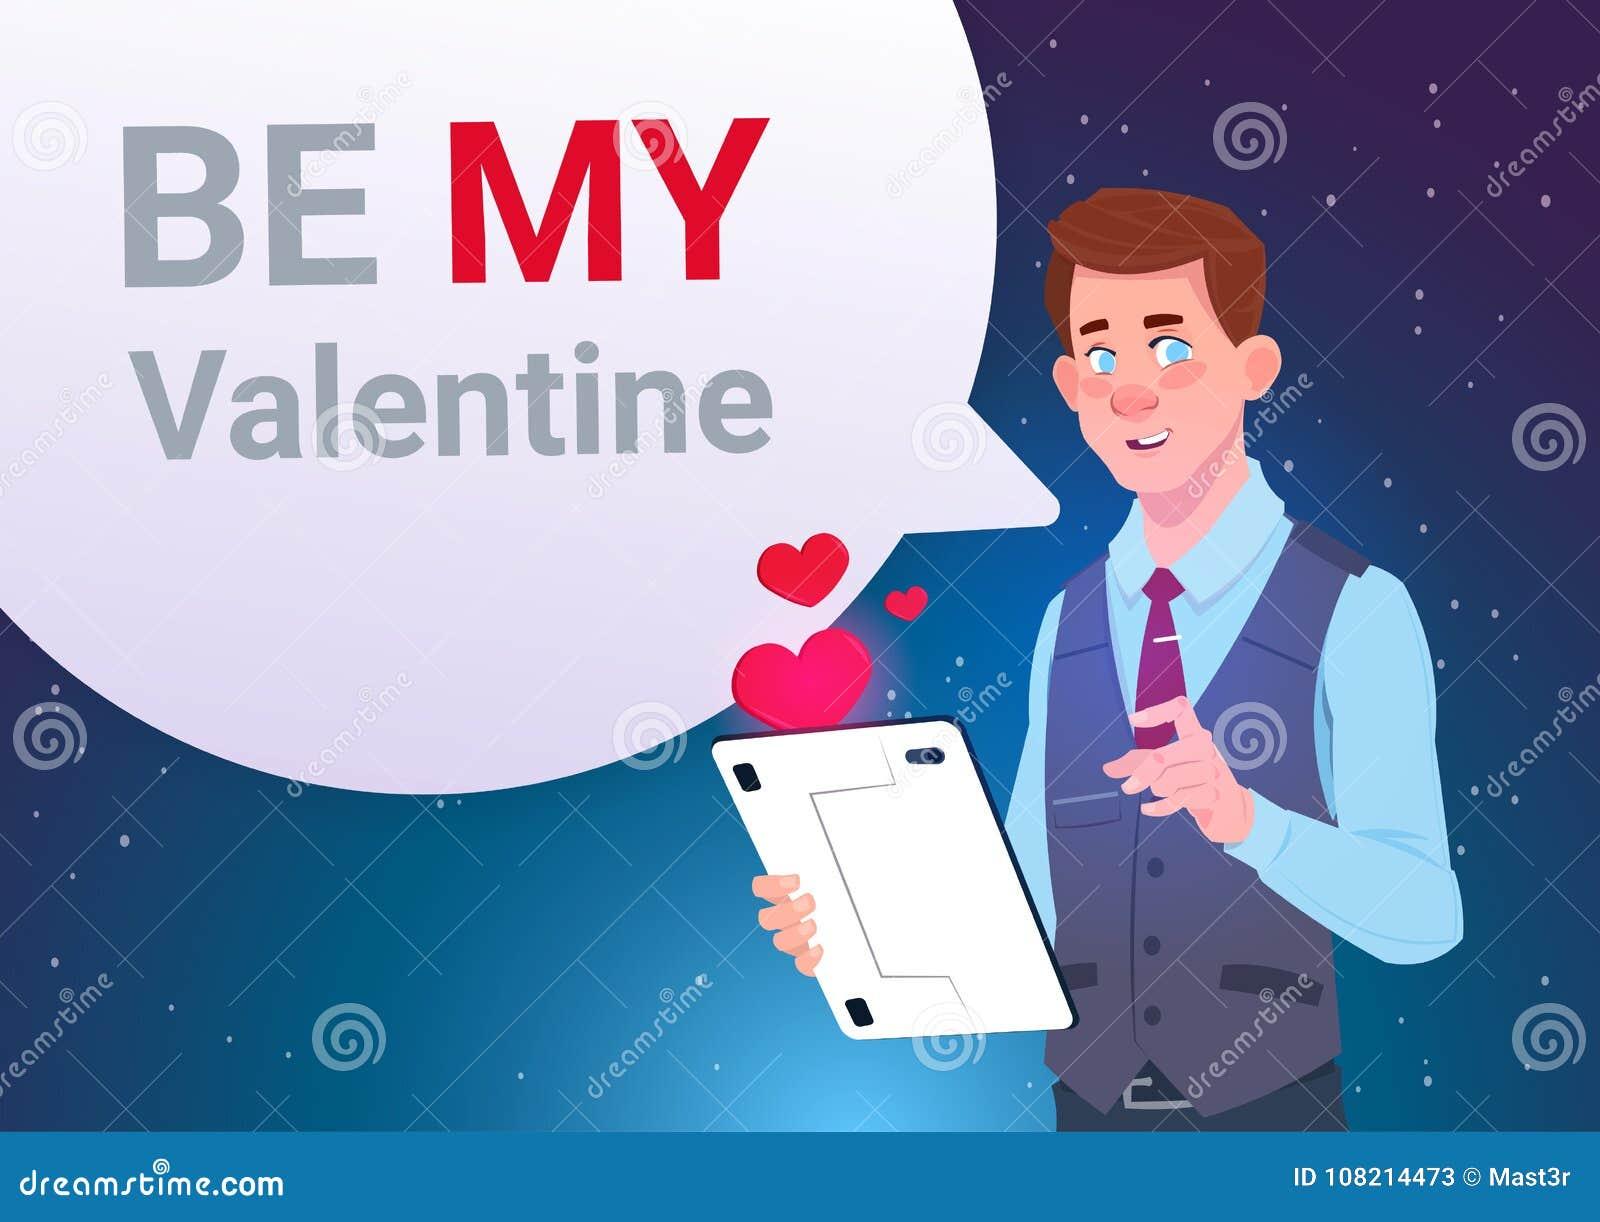 Be my valentine invitation greeting card man holding digital tablet be my valentine invitation greeting card man holding digital tablet sending message m4hsunfo